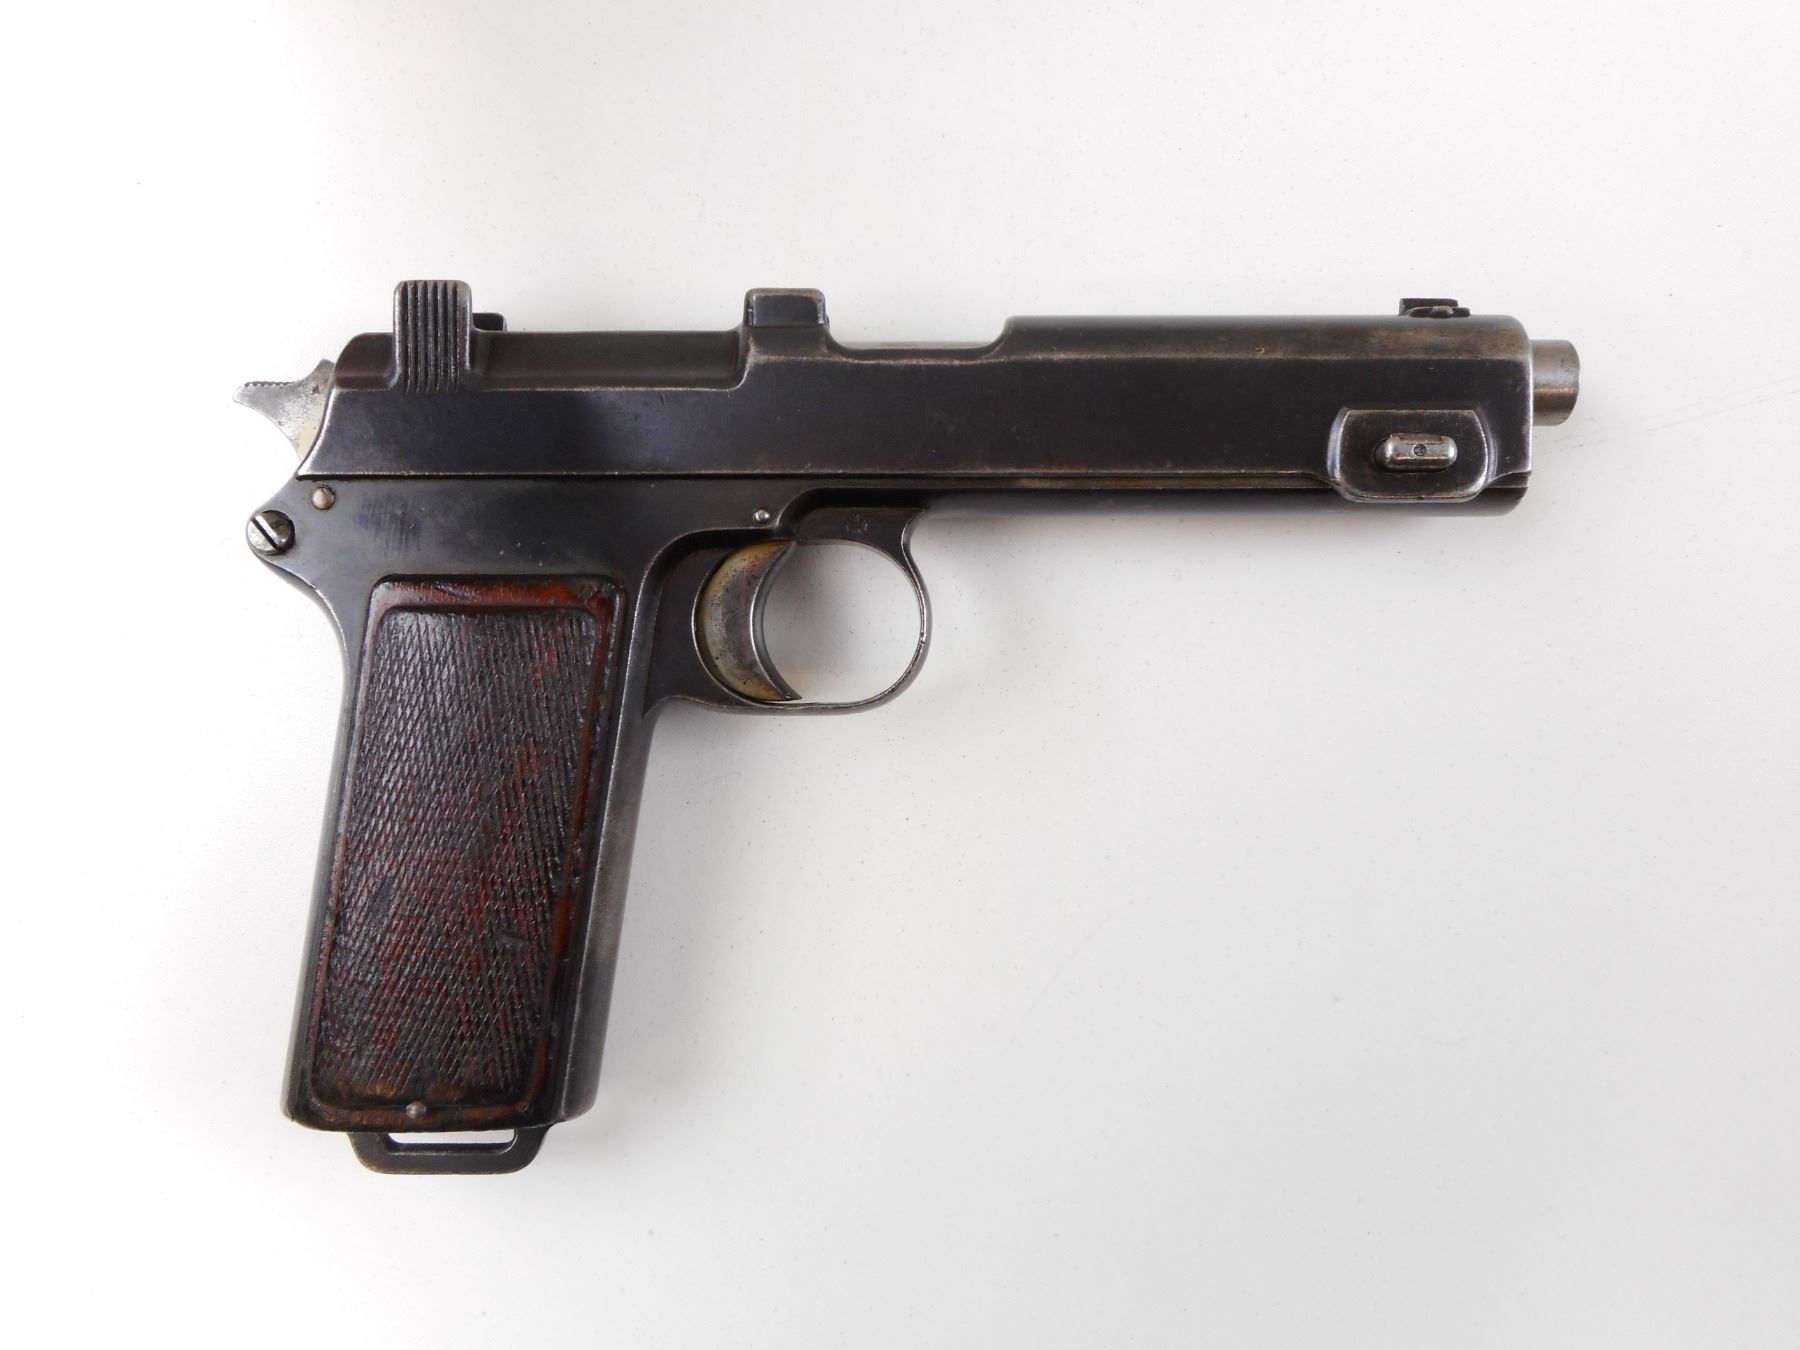 STEYR, MODEL: 1912, CALIBER: 9MM STEYR